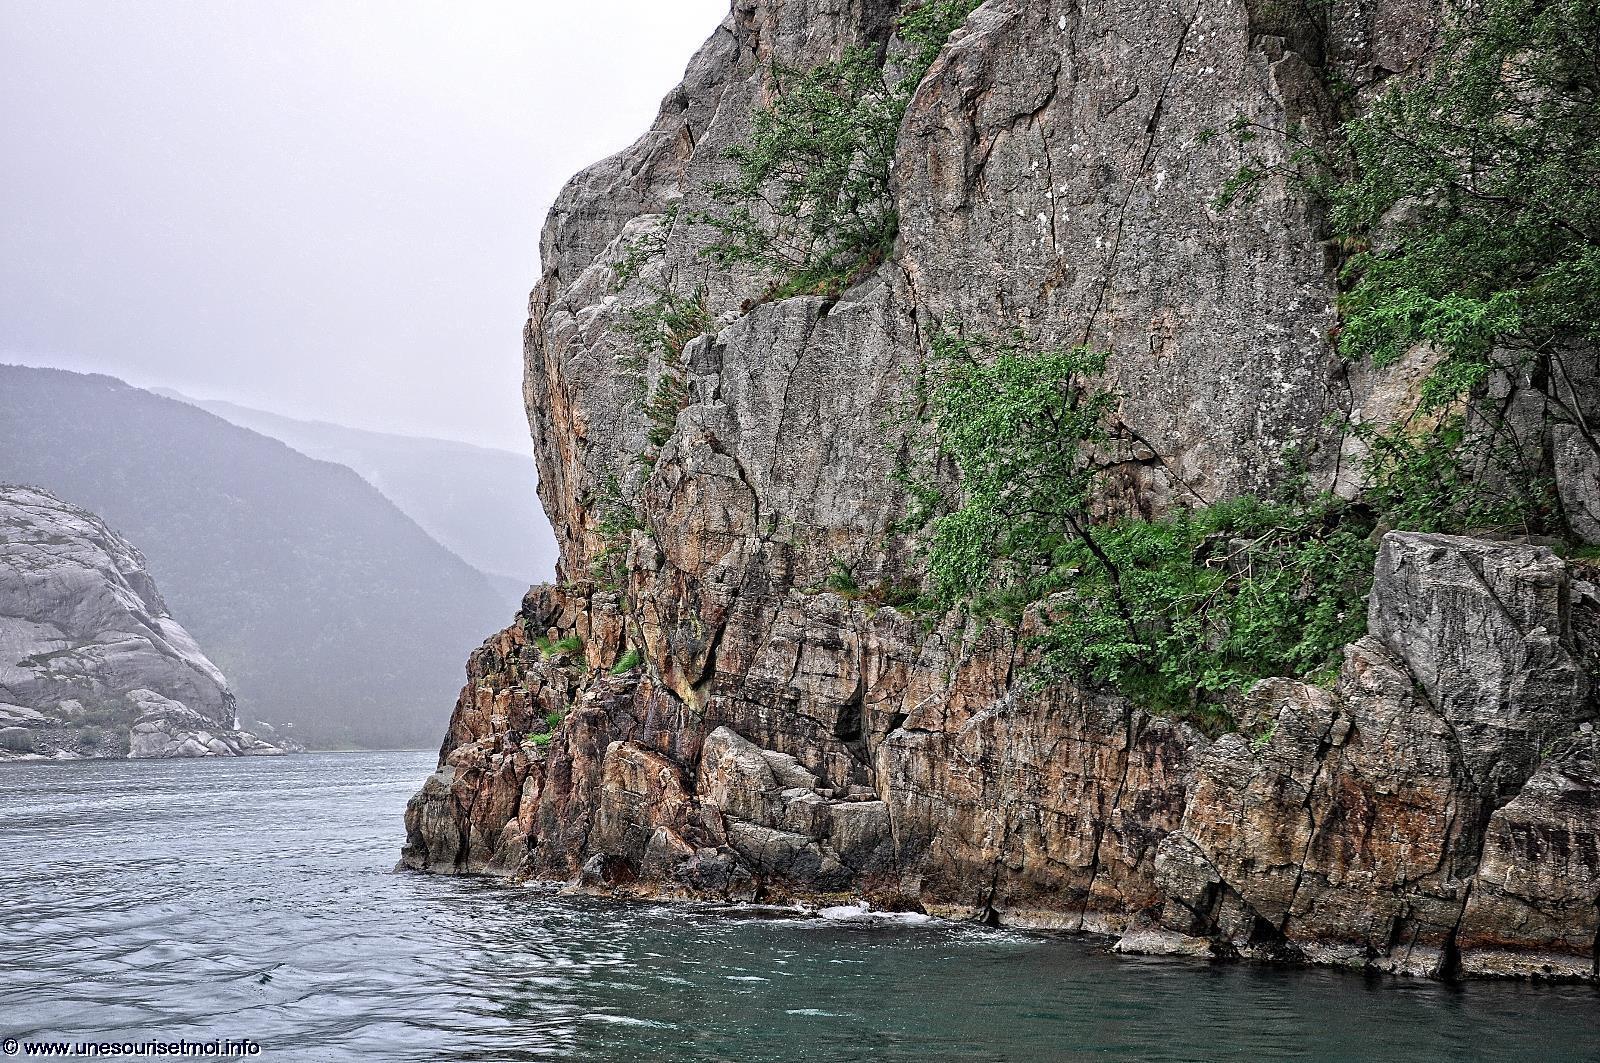 norvege-rocher_entree-du-fjord_naviguer